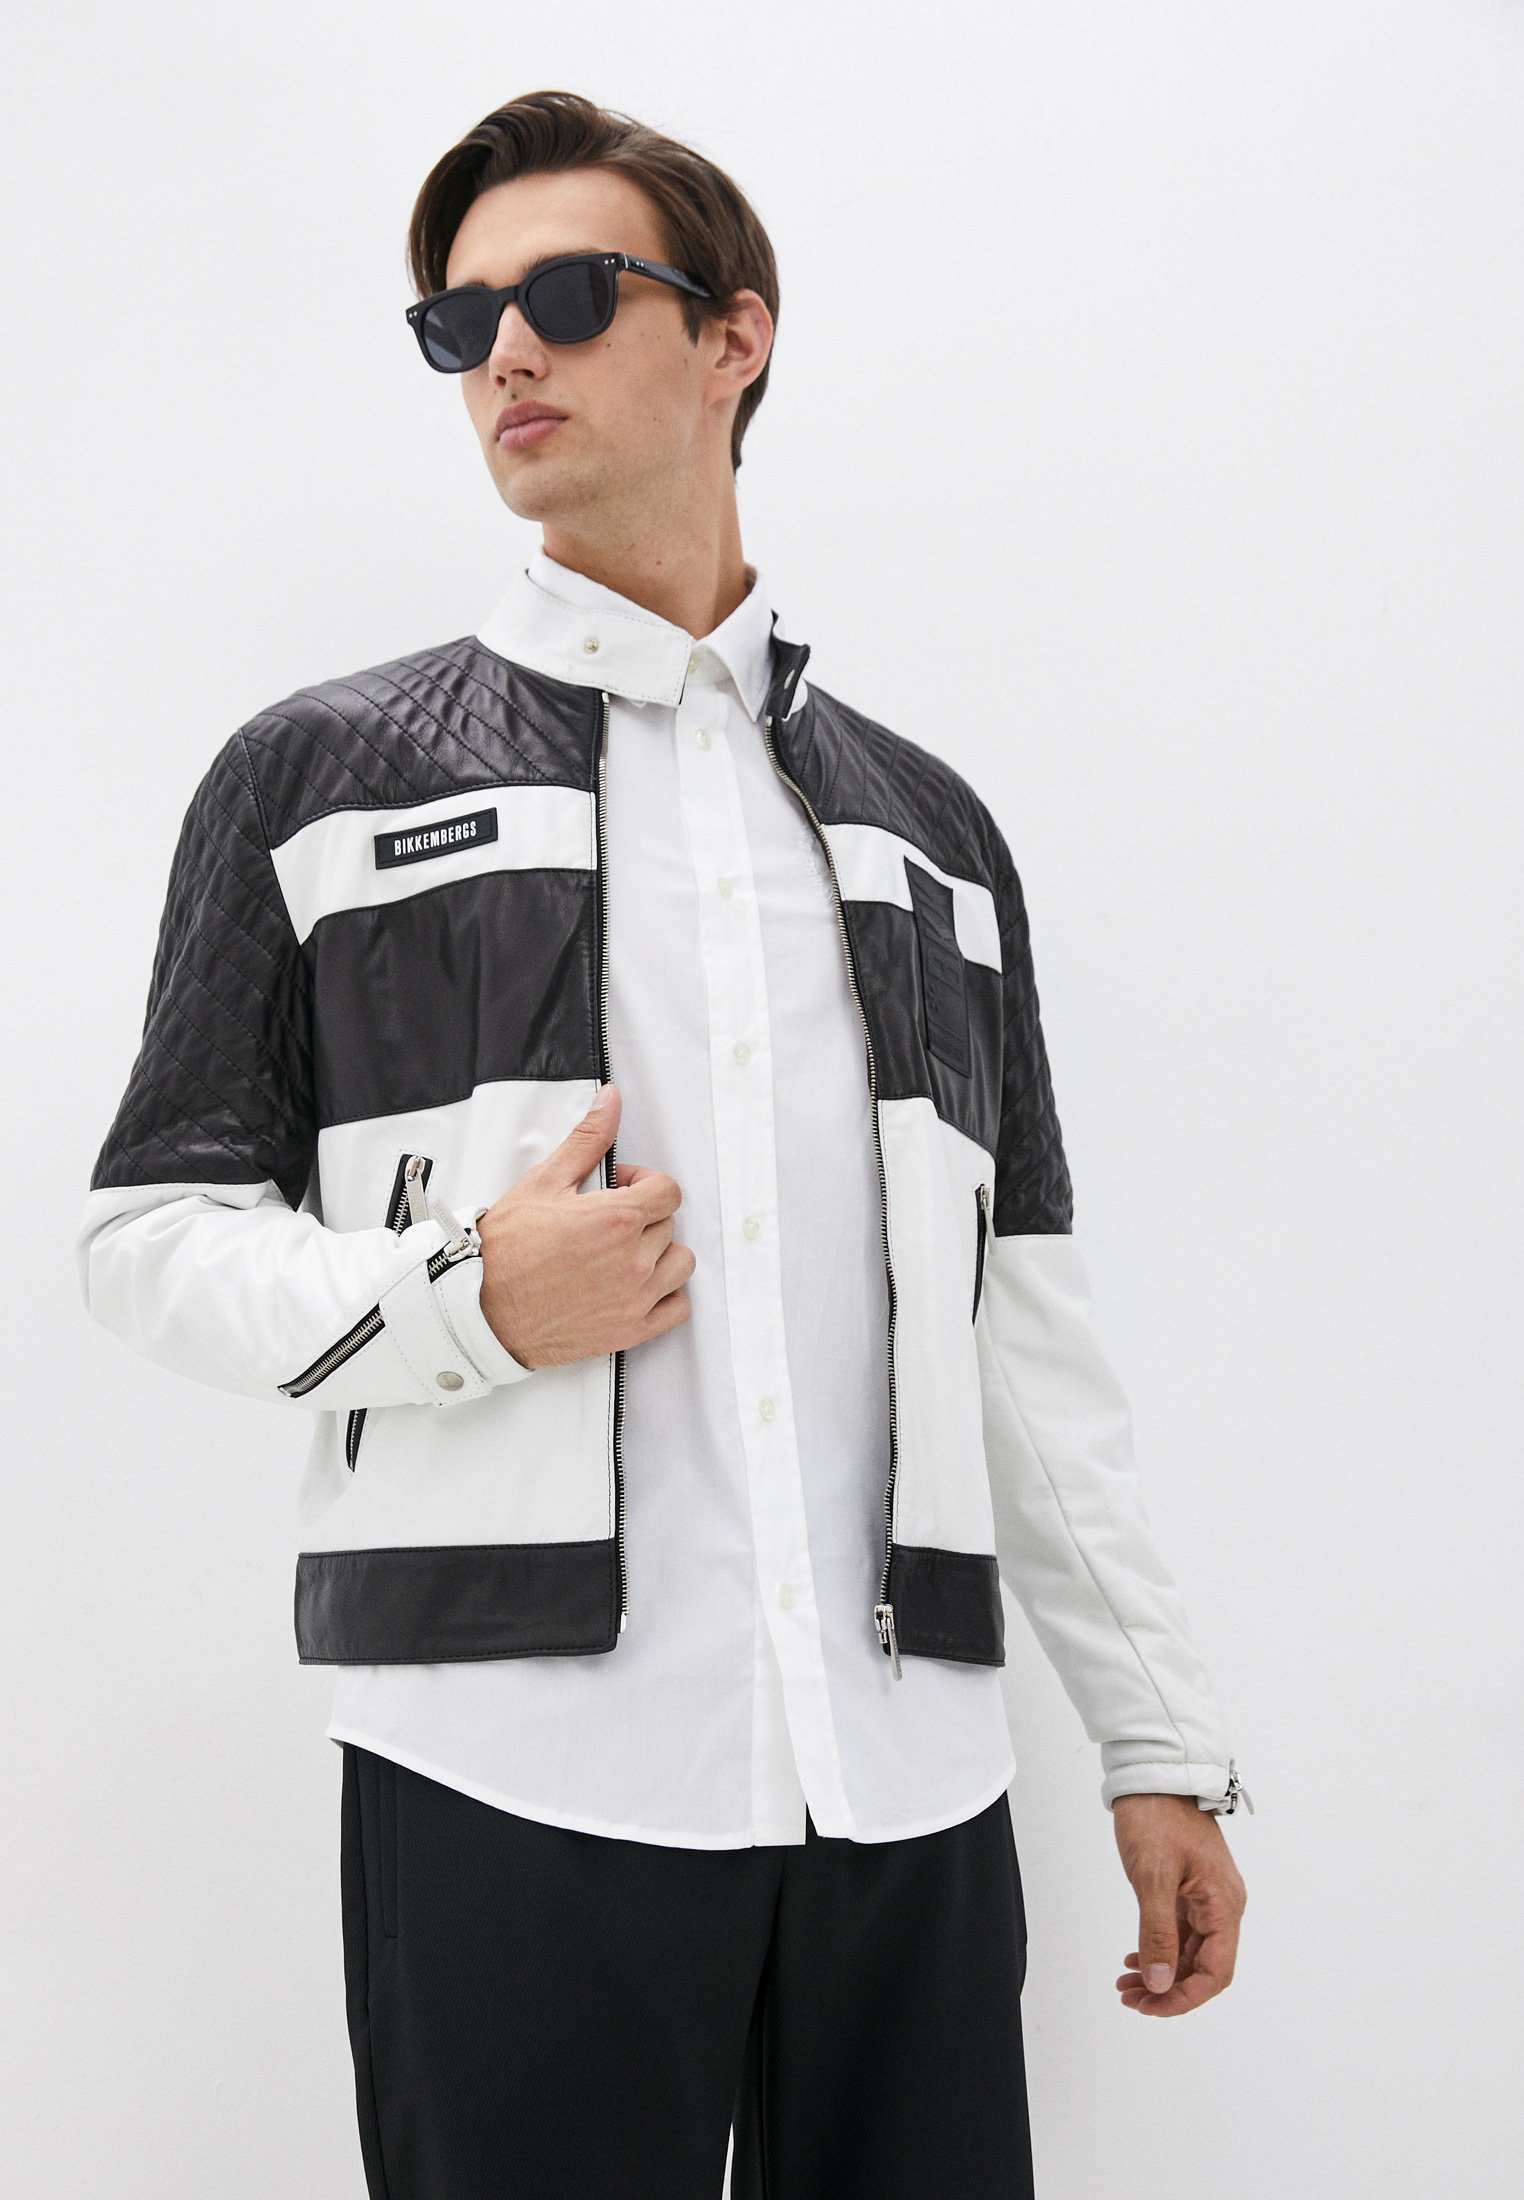 Кожаная куртка Bikkembergs (Биккембергс) C H 117 80 D 1180: изображение 1